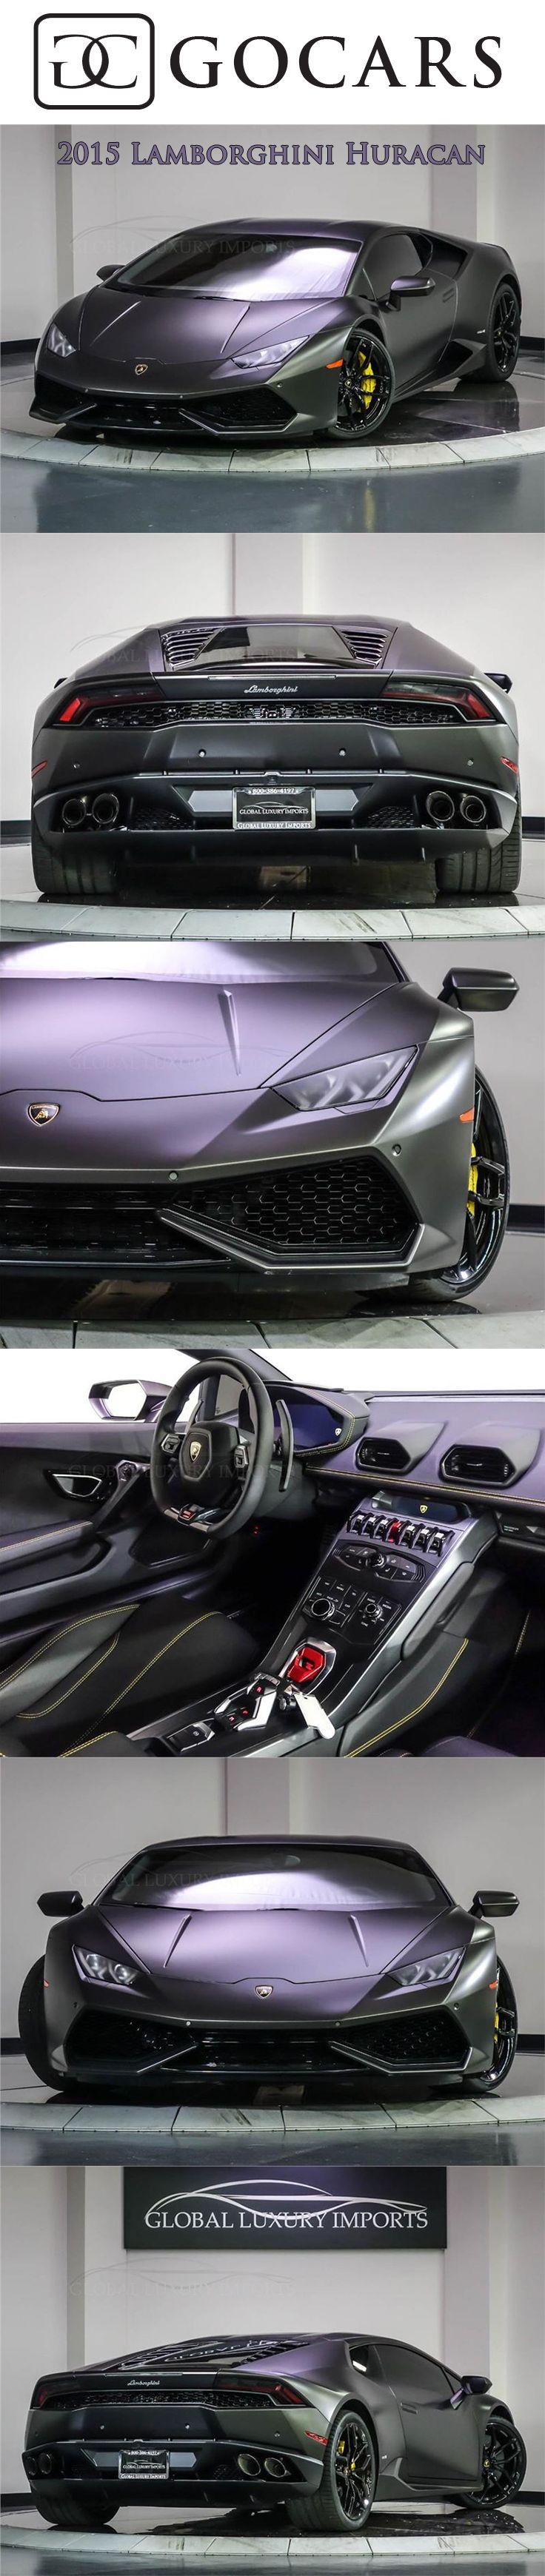 00a94a837ea2bfbc53db83ae8e62b738--lamborghini-huracan-sportscar Amazing 2015 Lamborghini Huracan Price Per Month Cars Trend